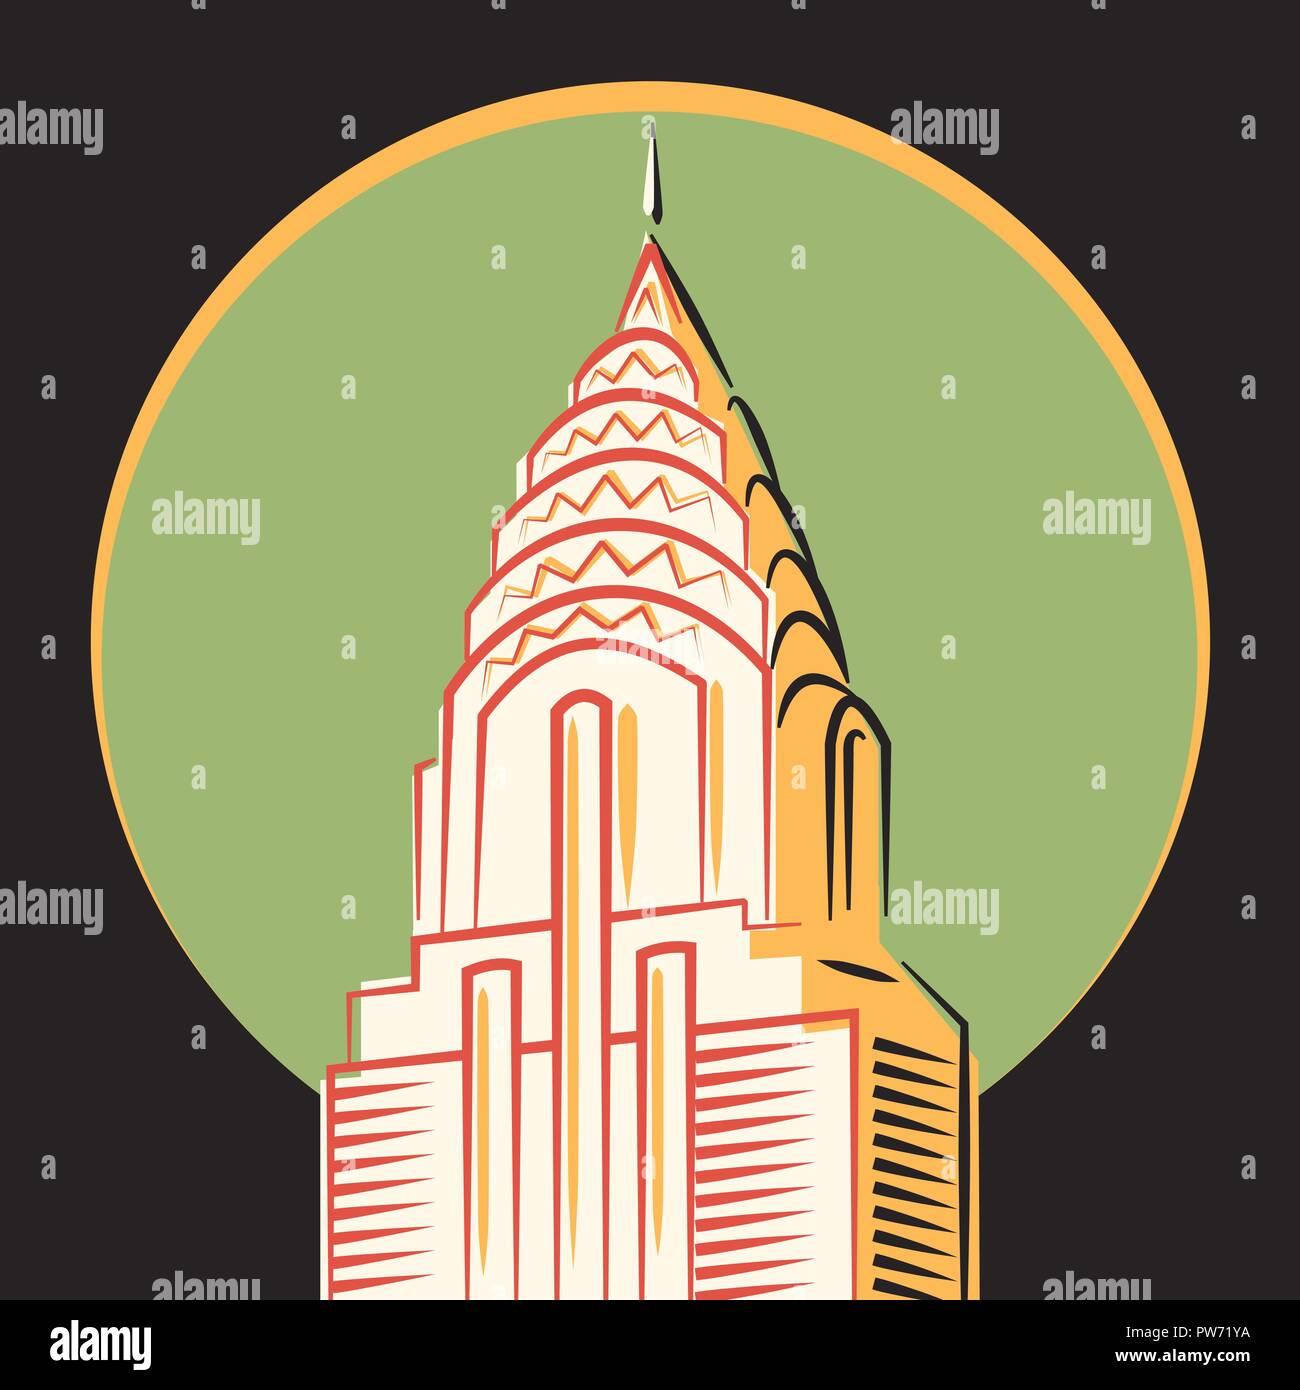 Minimalistic vector icon, The Chrysler Building, New York - Stock Vector